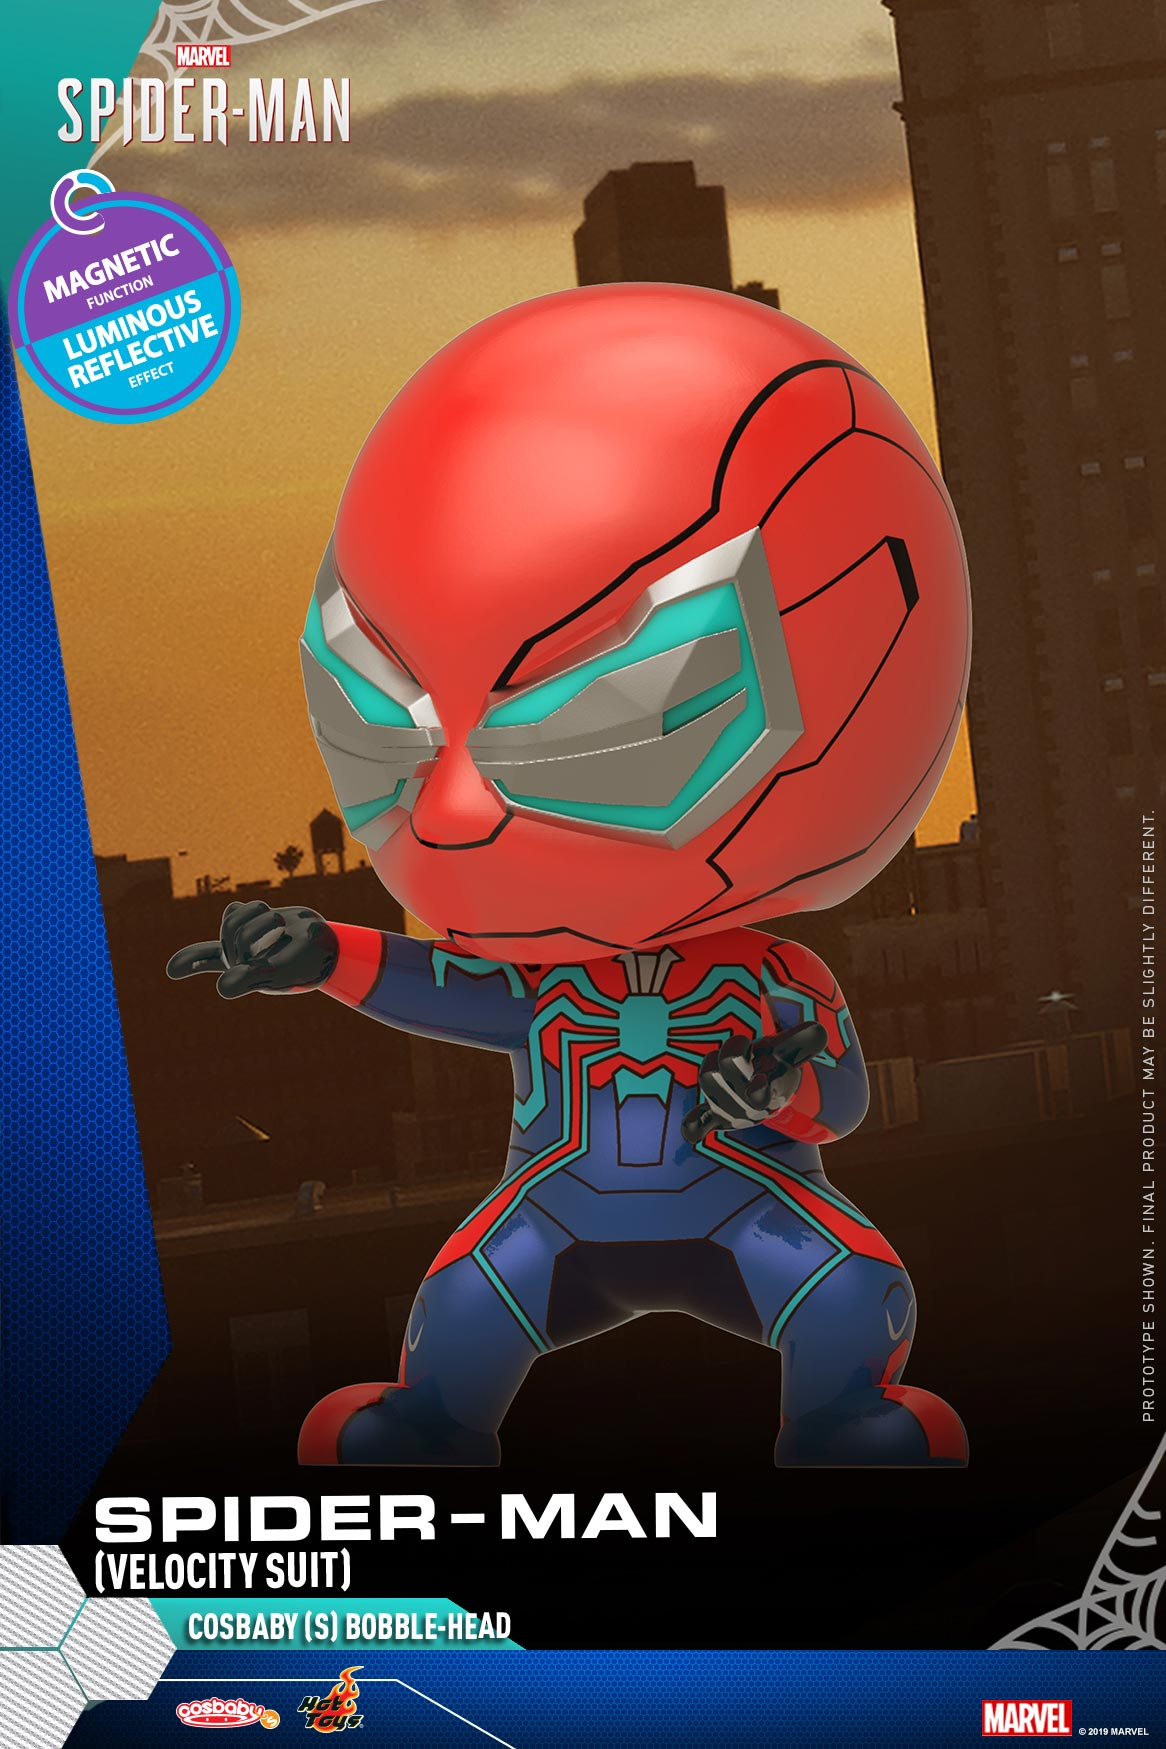 Hot-Toys---Marvel-Spider-Man---Spider-Man-(Velocity-Suit)-Cosbaby-(S)_PR1